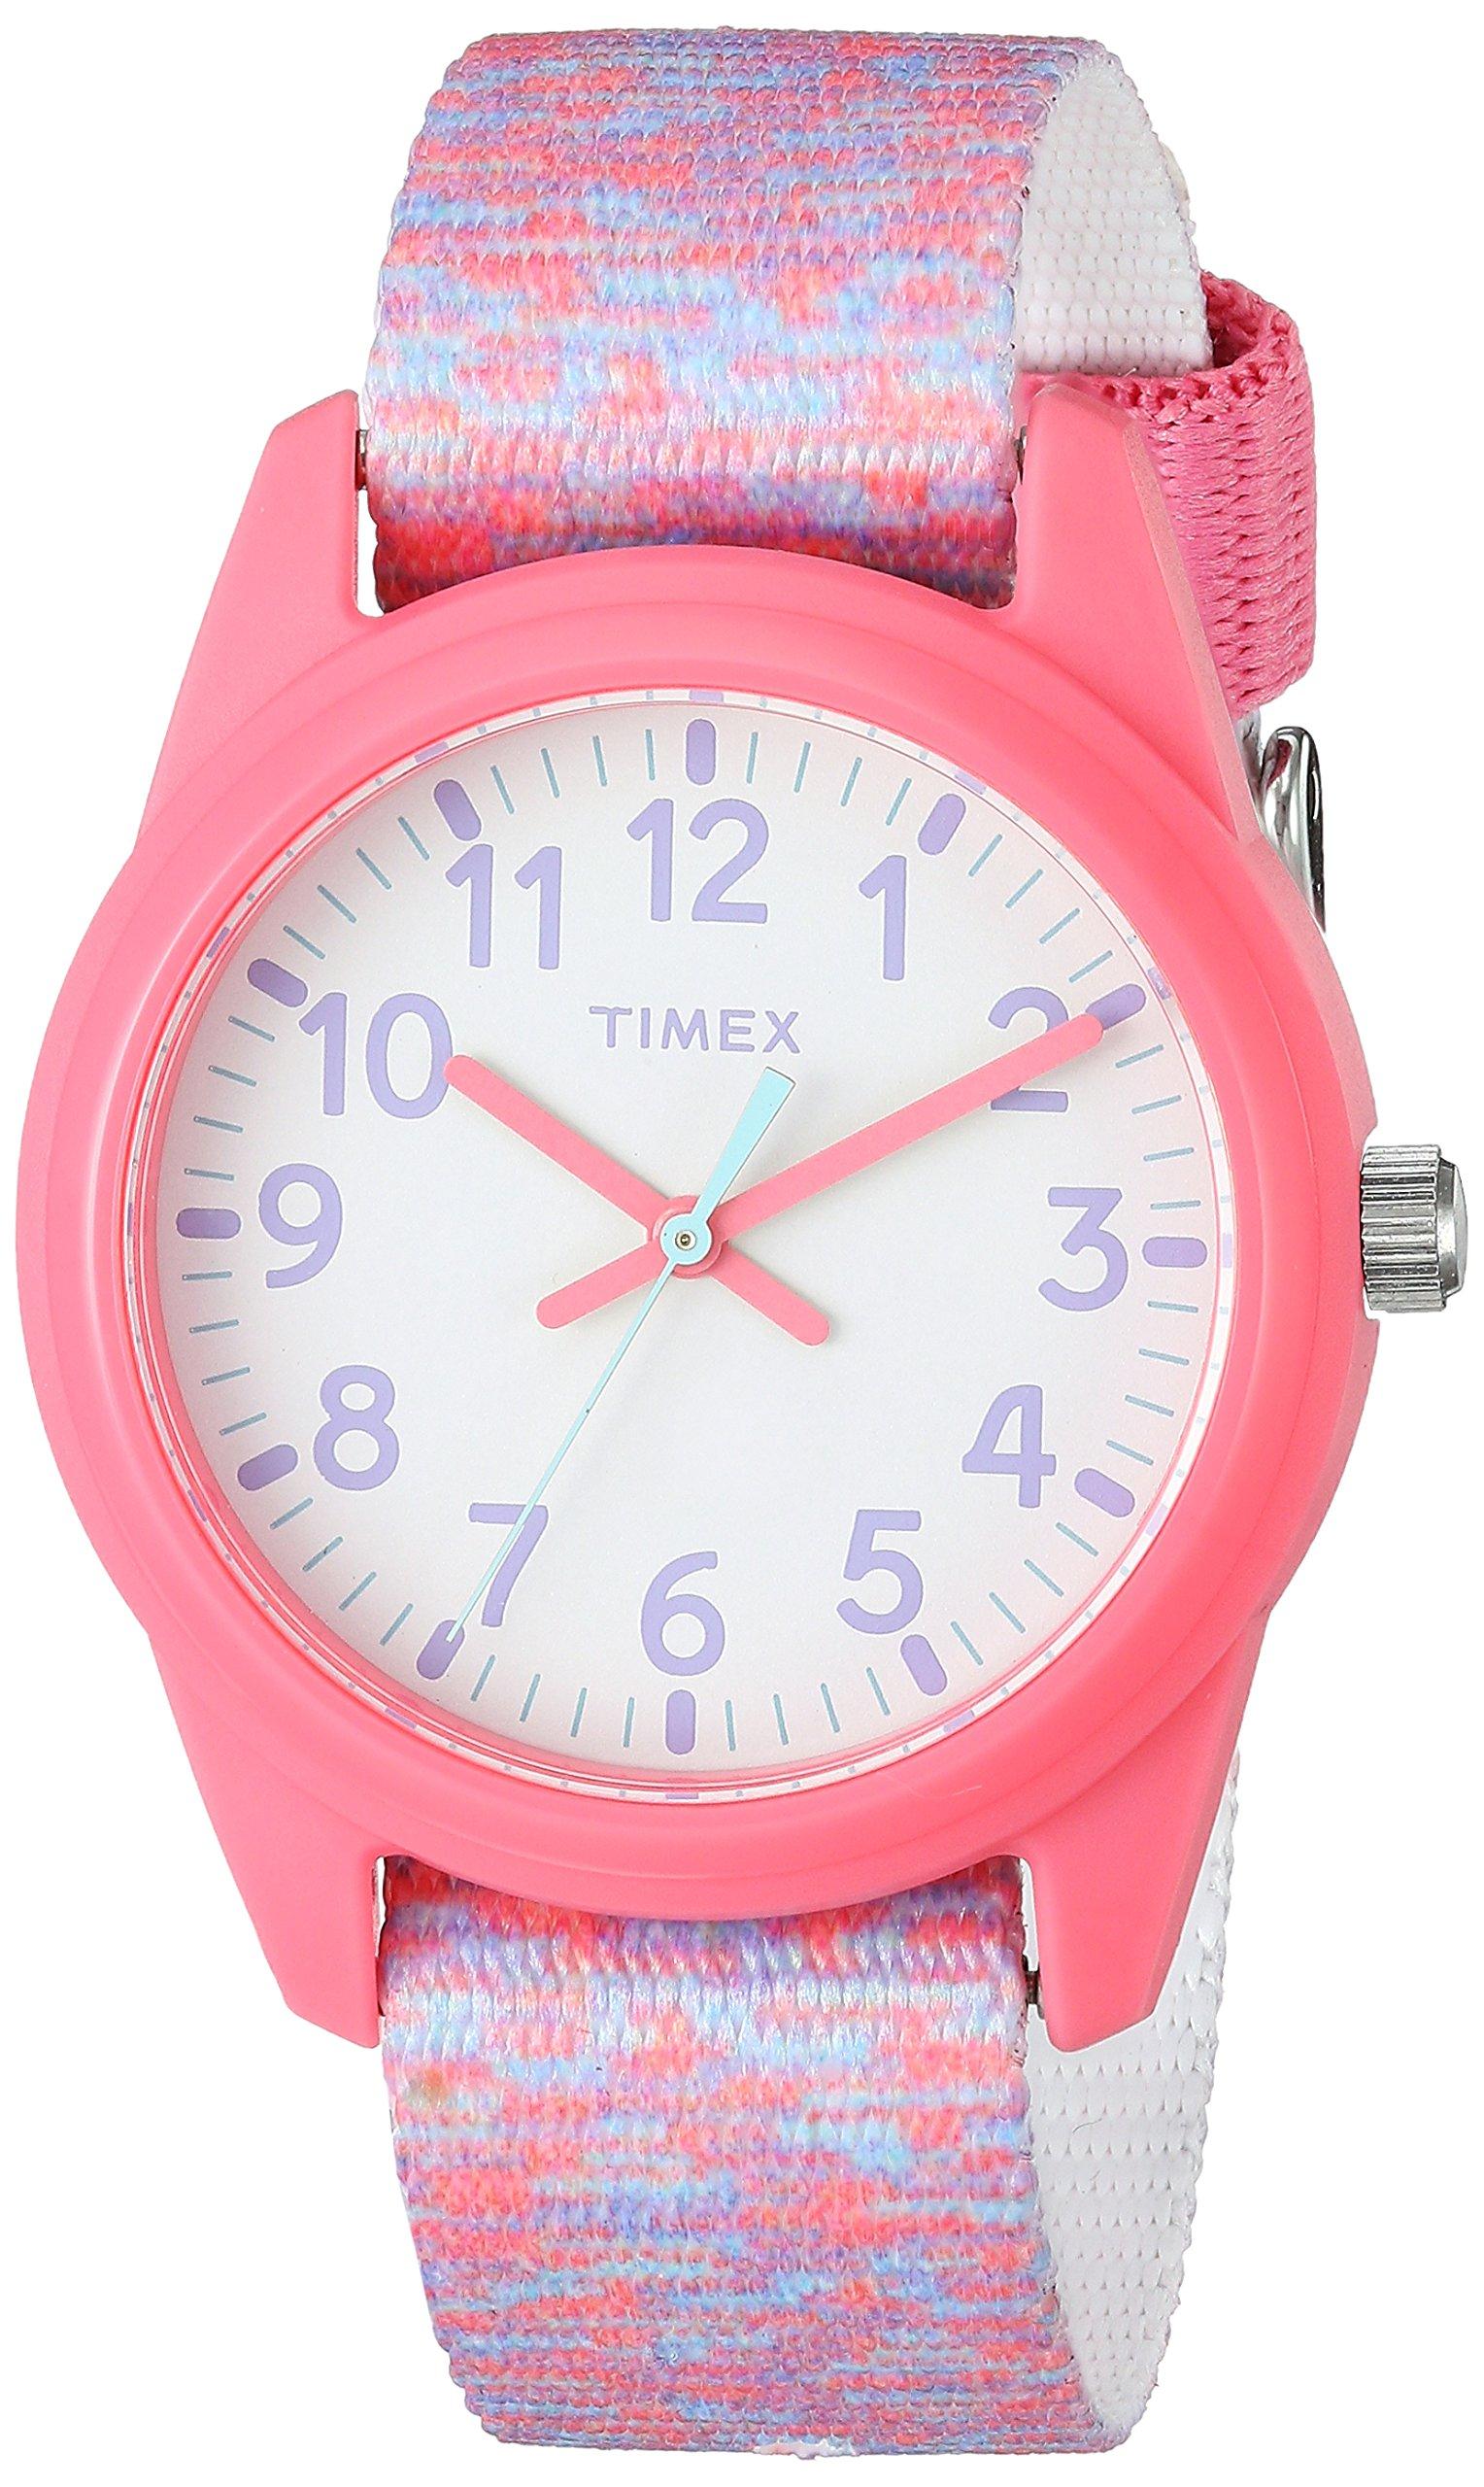 Timex Girls TW7C12300 Time Machines Pink/White Sport Elastic Fabric Strap Watch